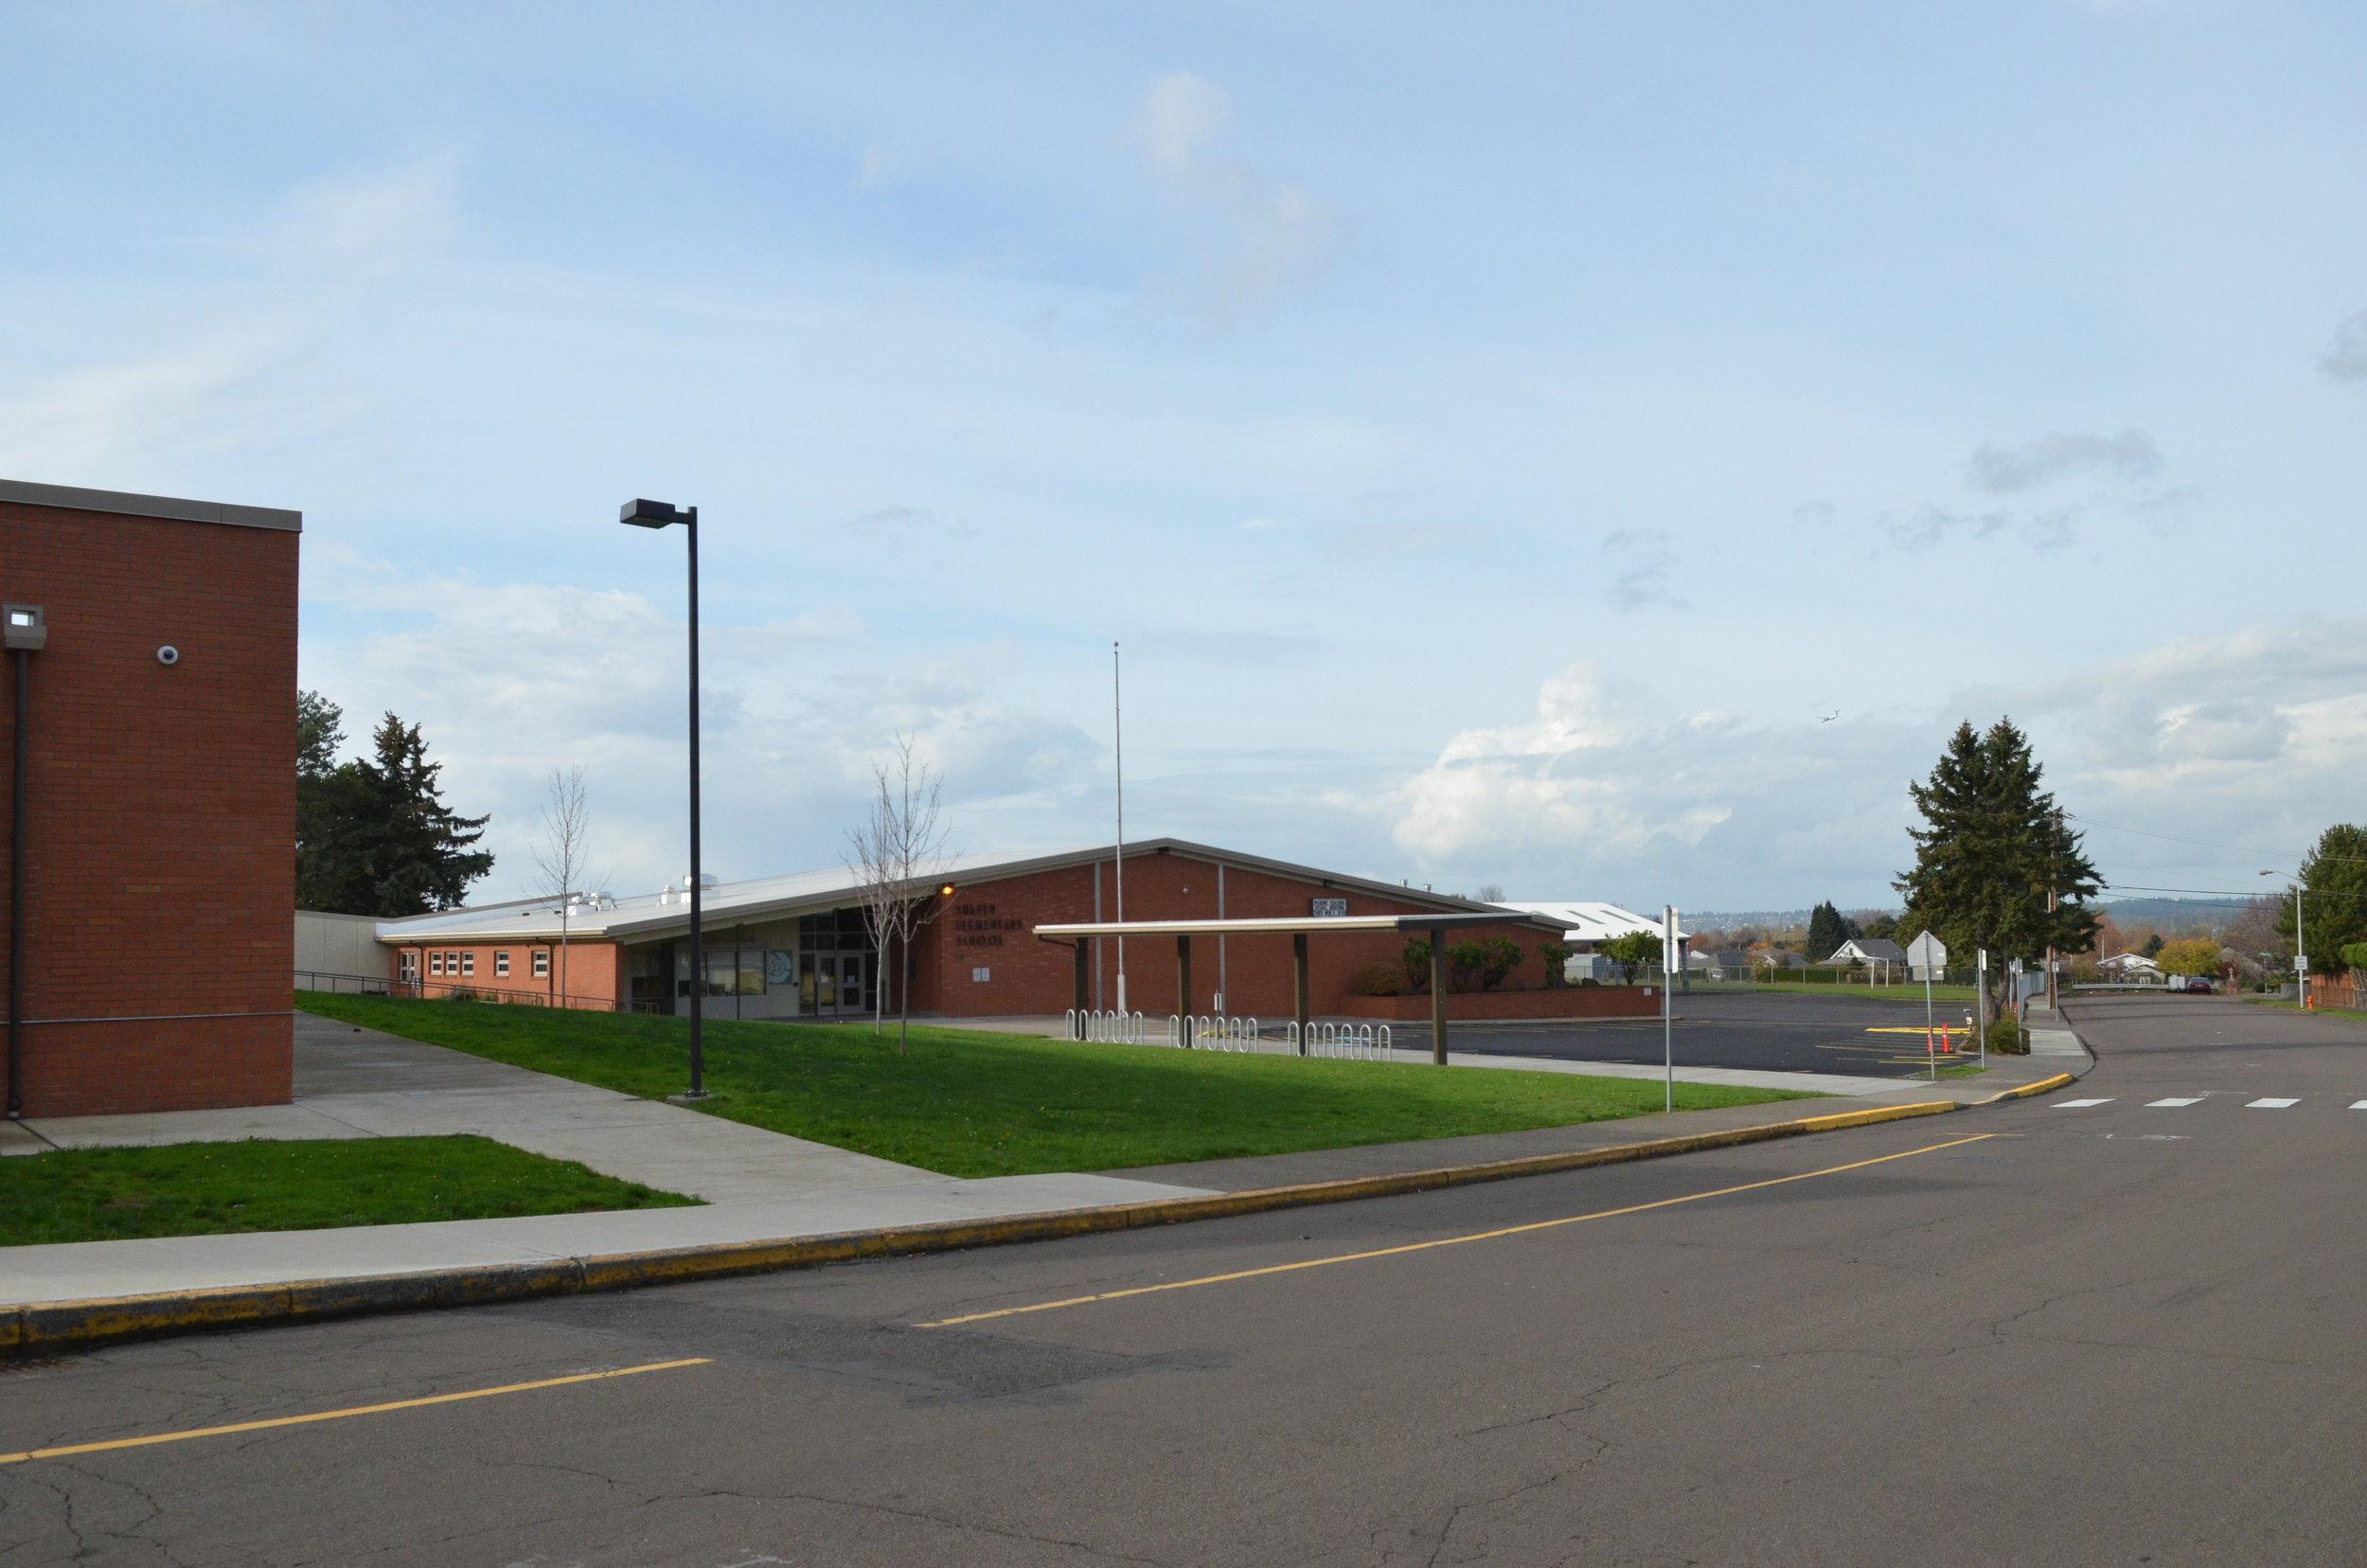 Shaver Elementary School in Argay Terrace on NE 131st Ave.